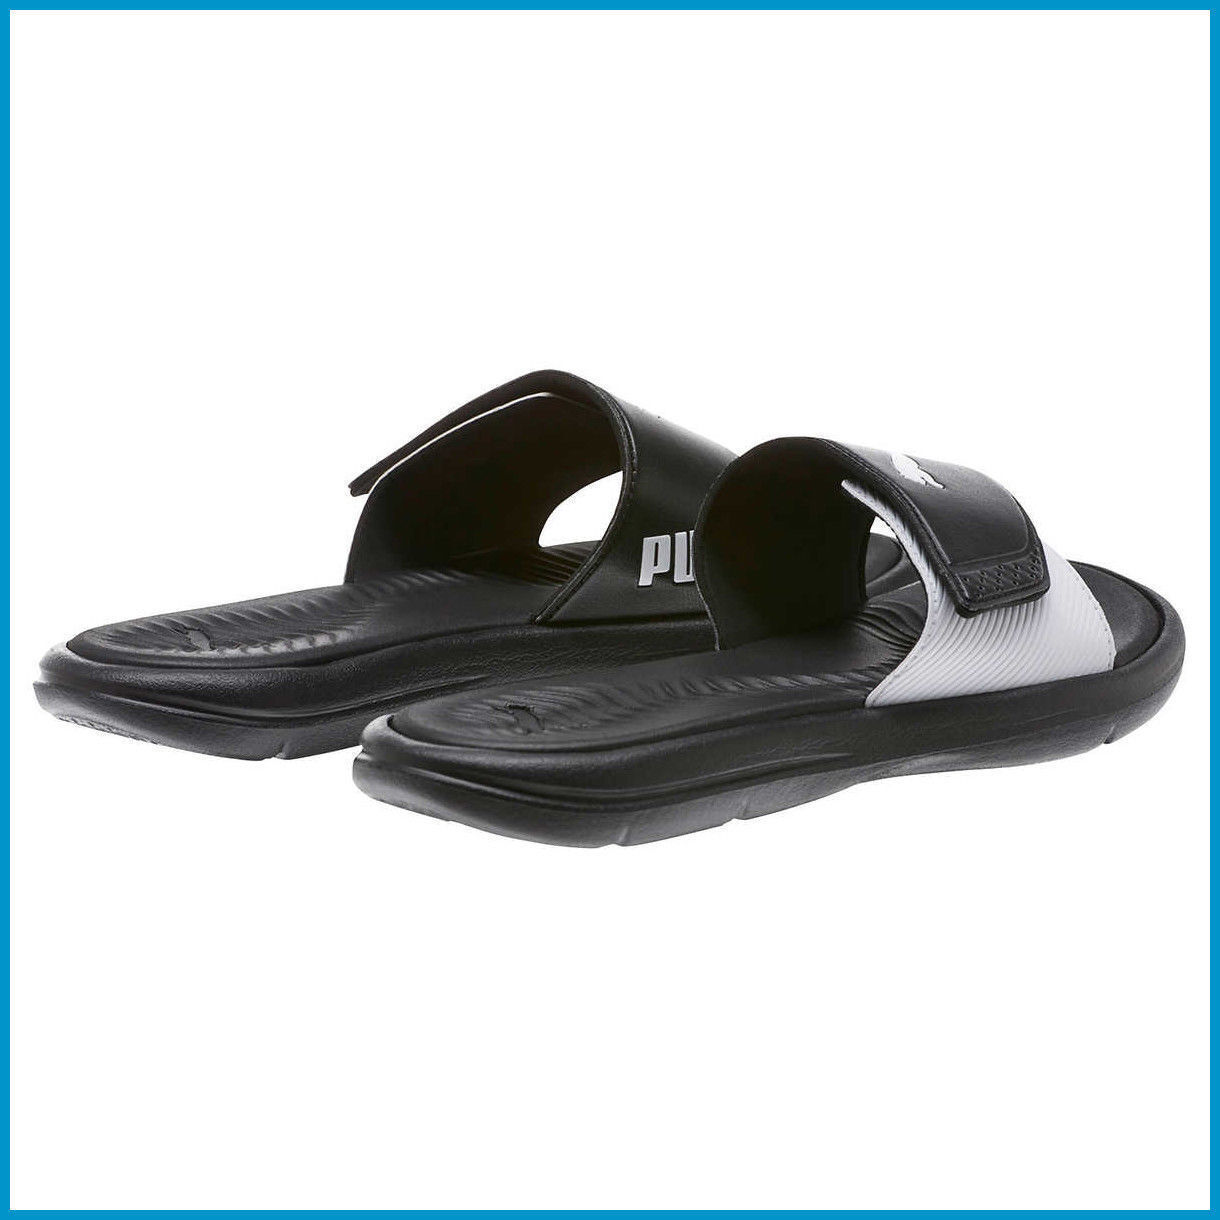 NEW - Puma Women's Surfcat Black Slide Slides Slip on Black Surfcat Sandals - size 7 08c6ab